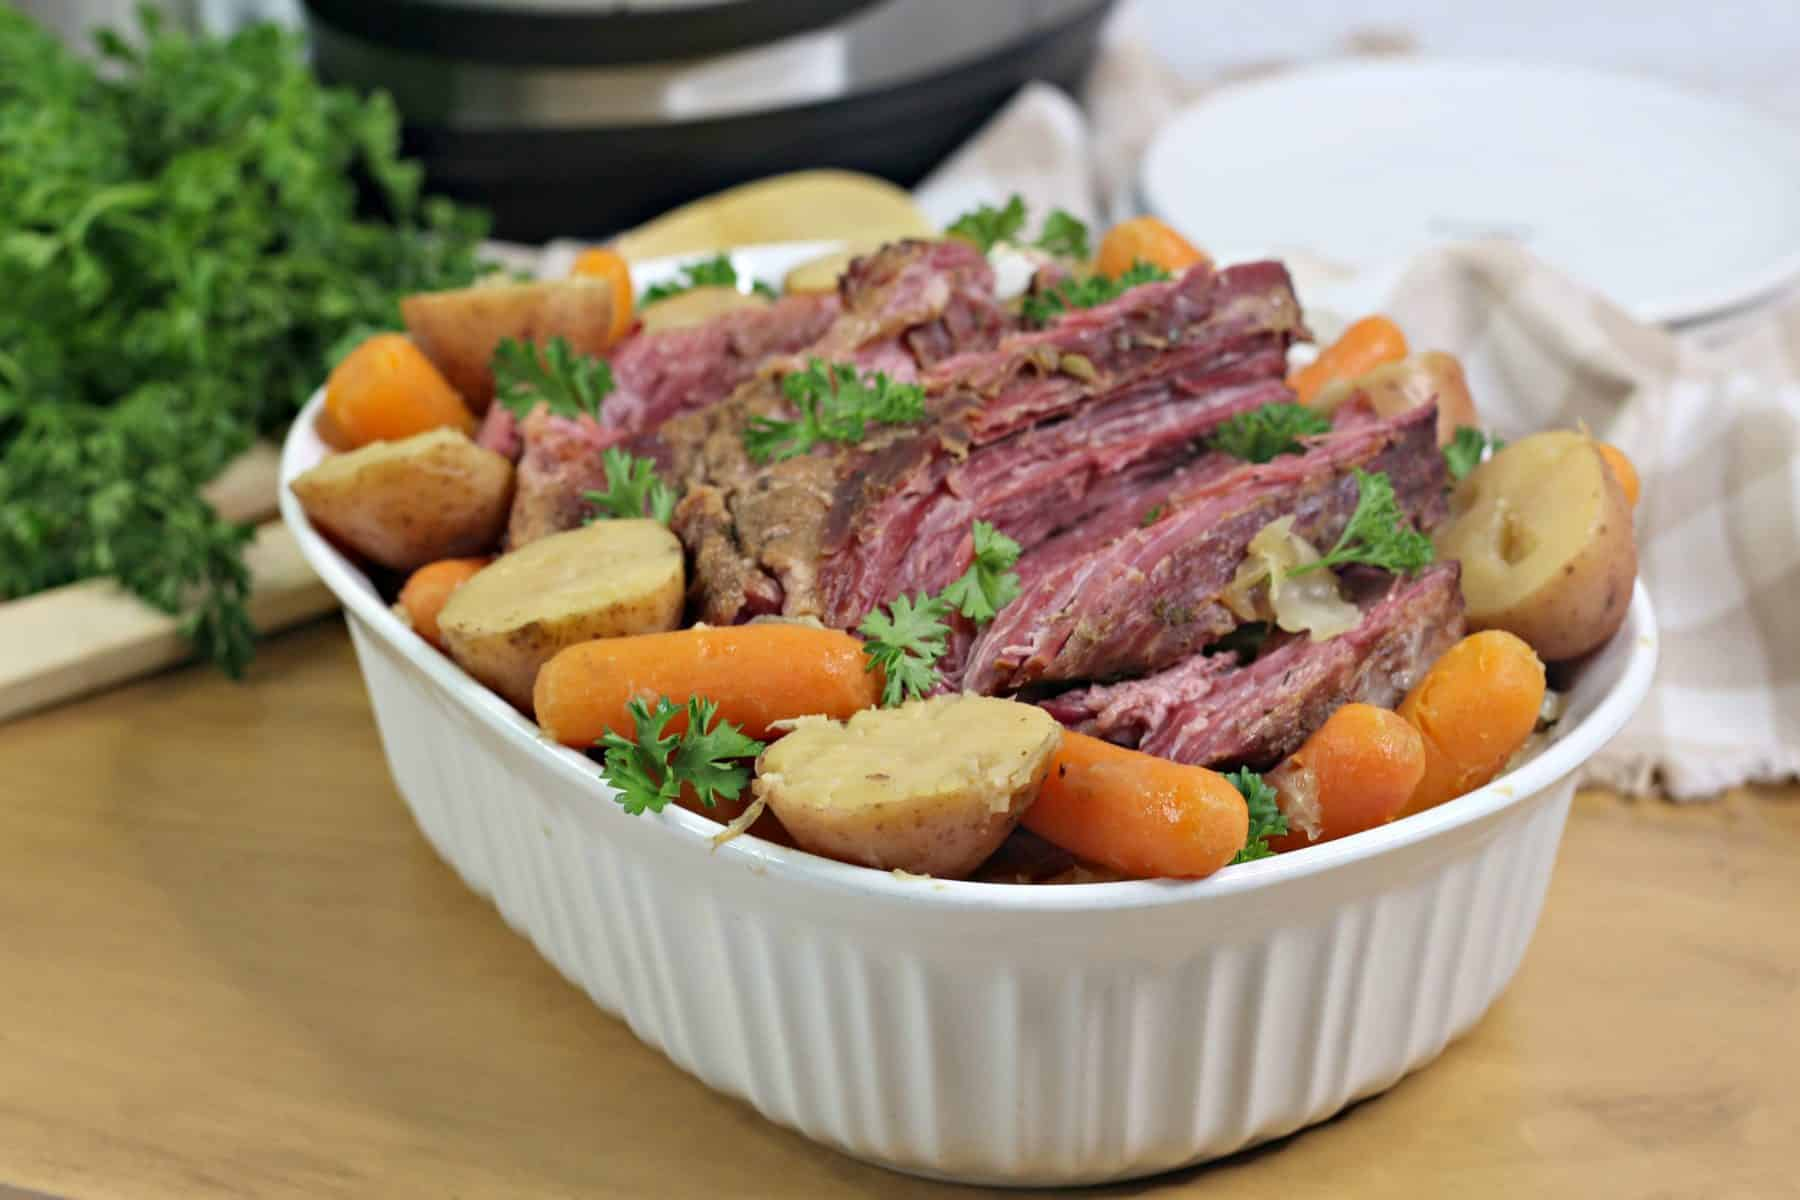 Guinness Corned Beef, Instant Pot Corned Beef